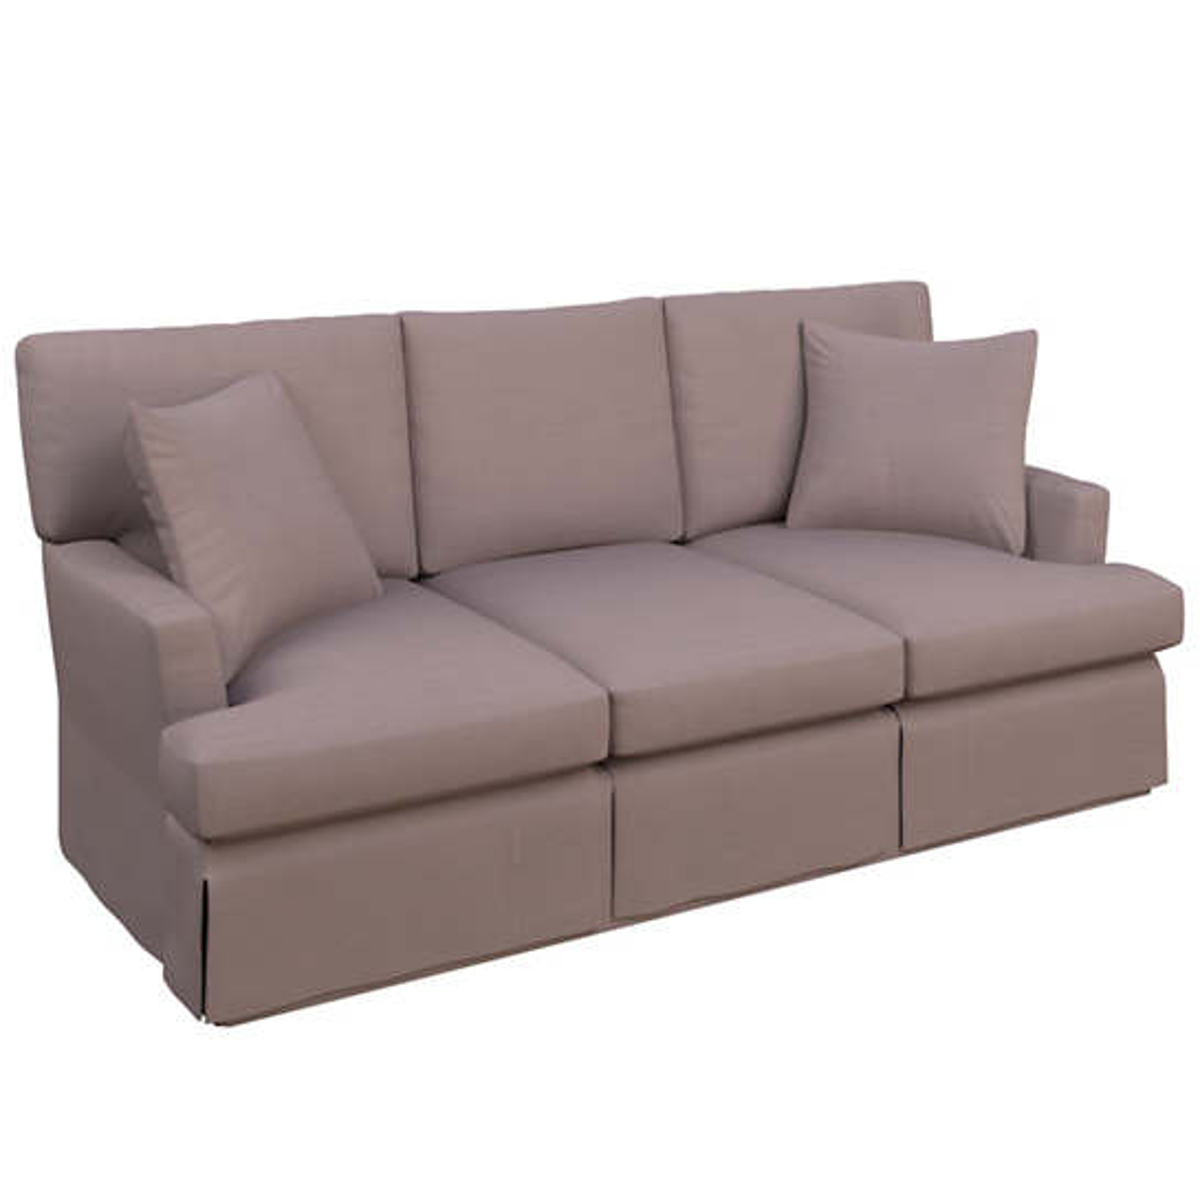 Weathered Linen Heather Saybrook 3 Seater Sofa